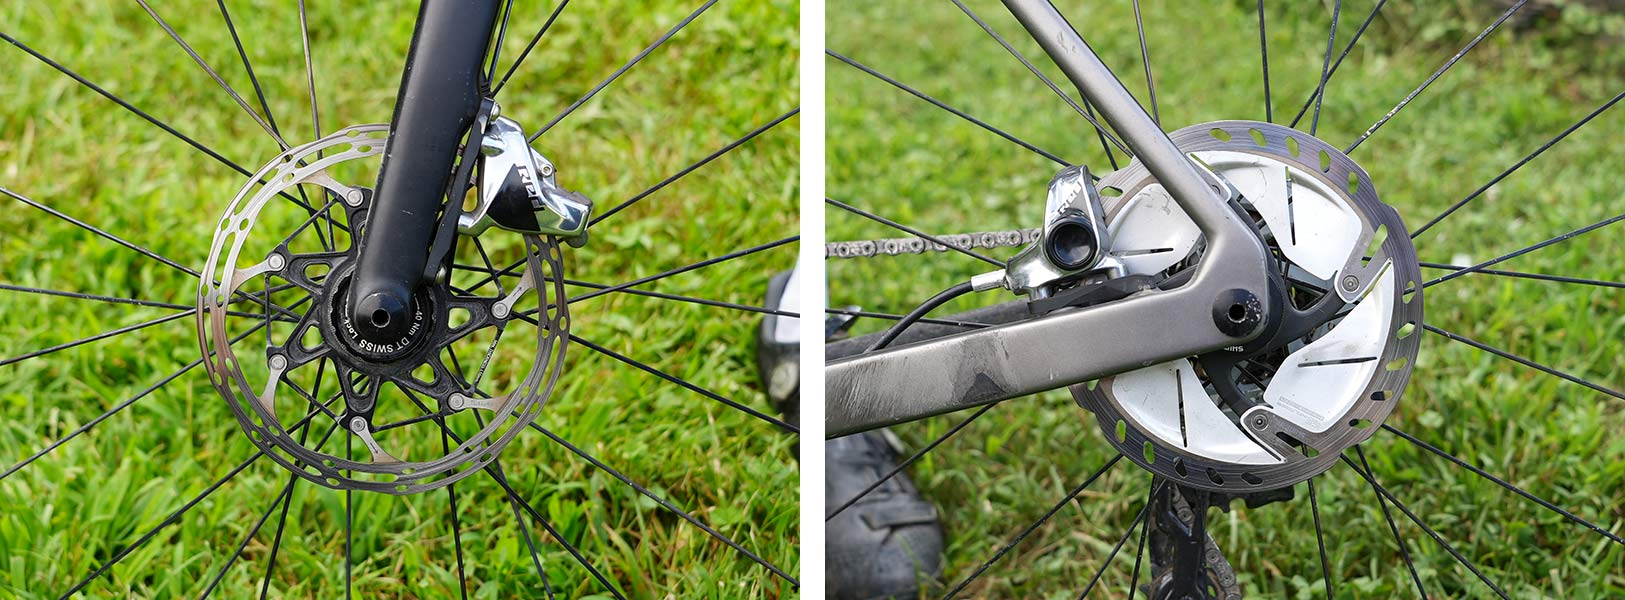 disc brakes closeup details on jeremiah bishop's gravel race bike